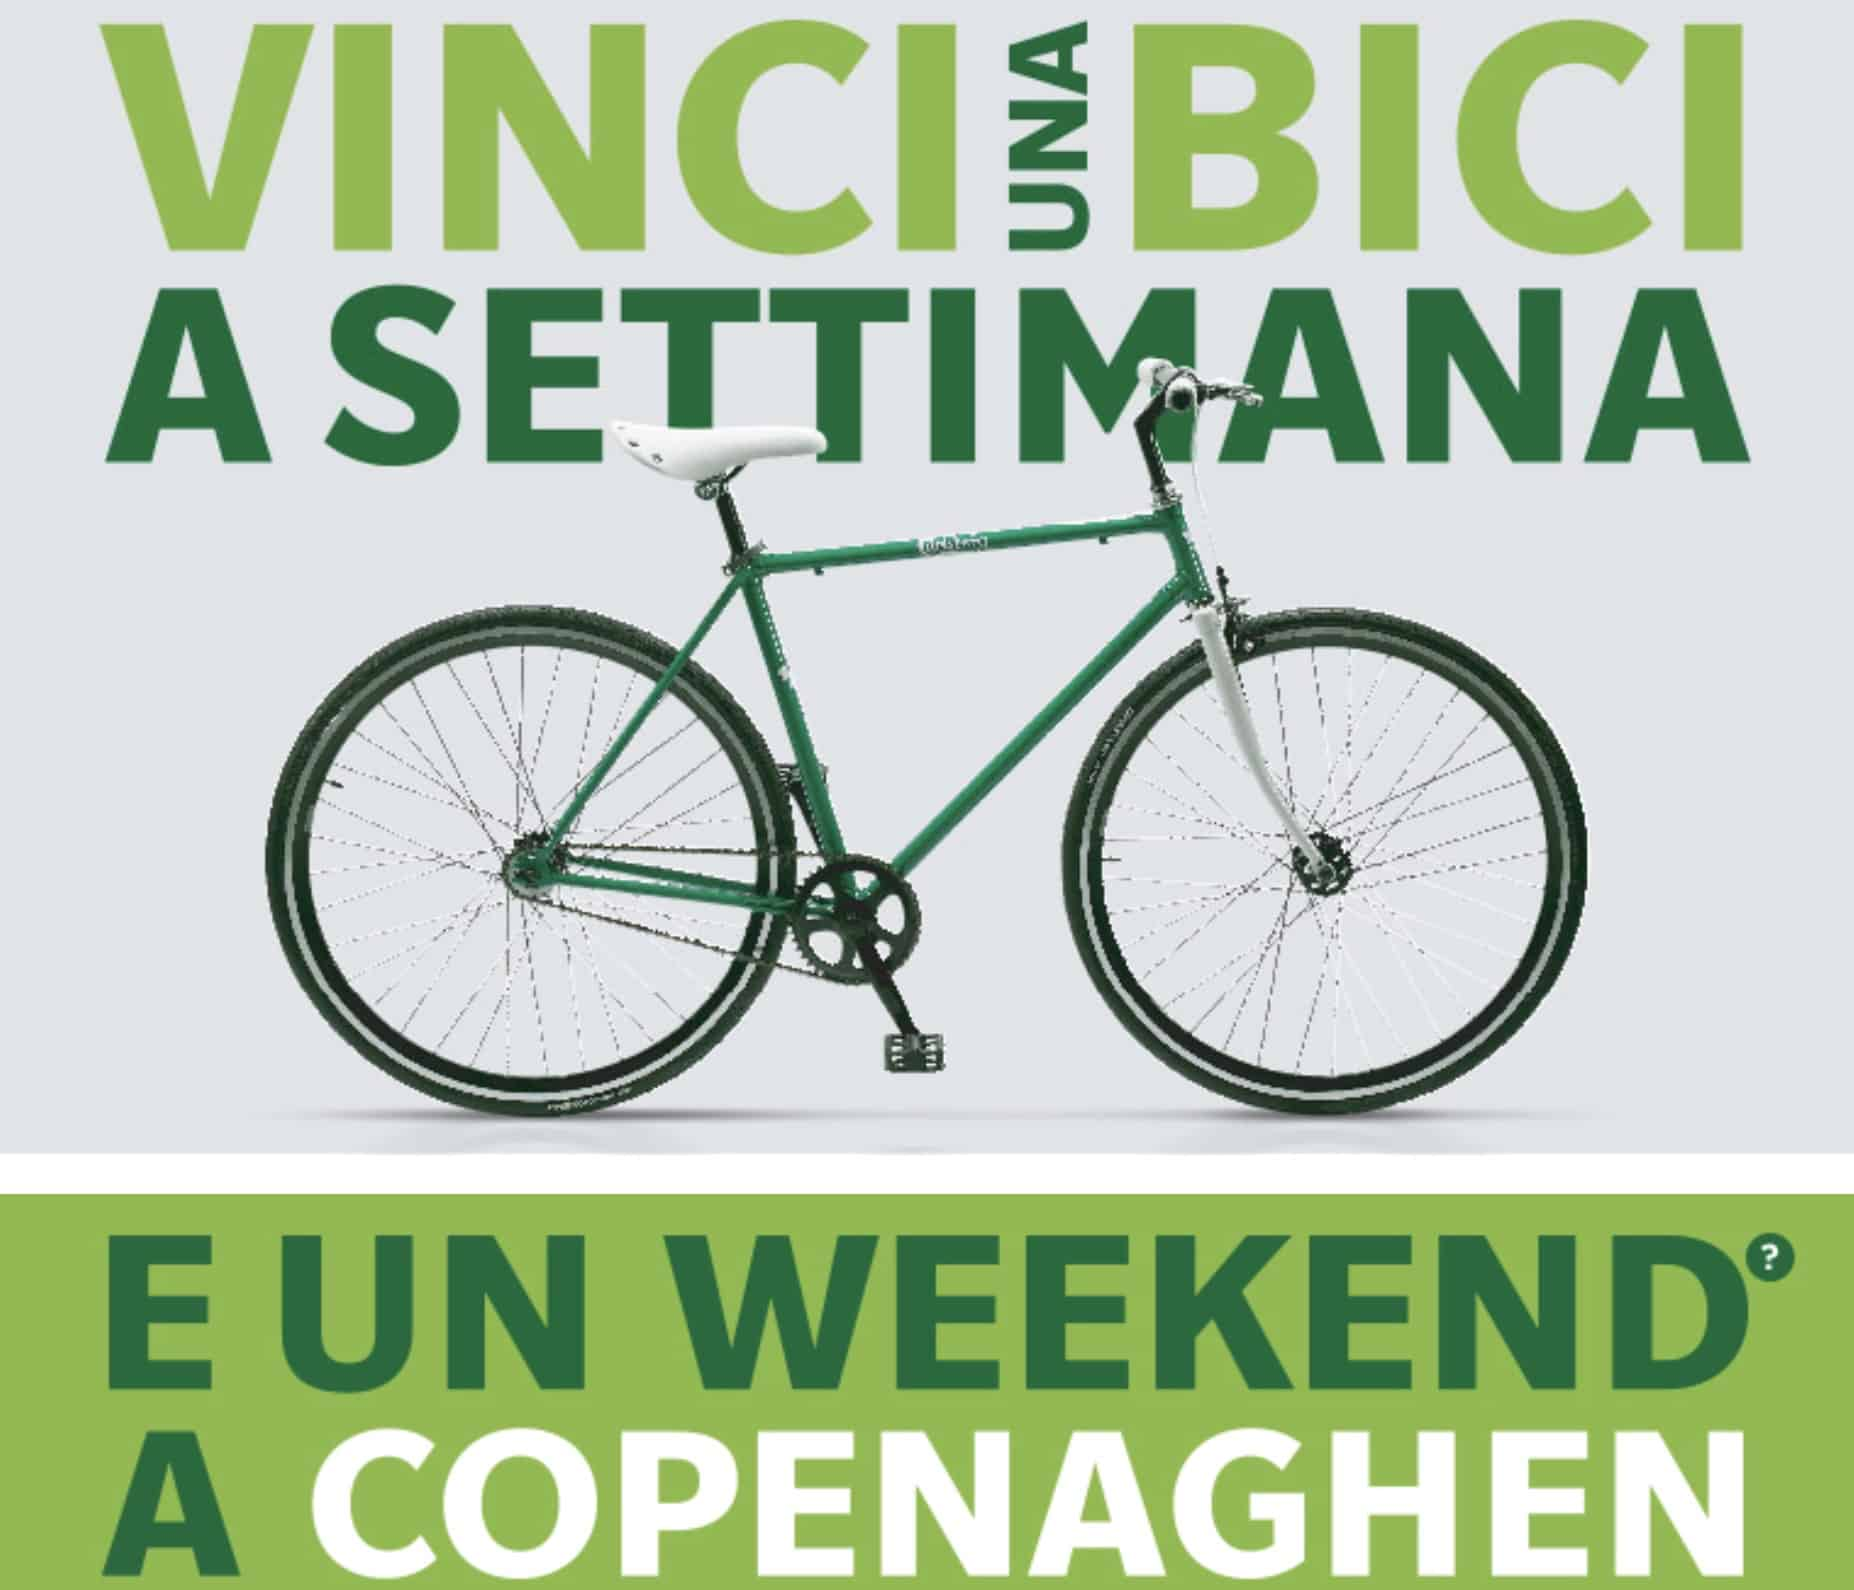 Carlsberg vinci biciclette brandizzate e weekend